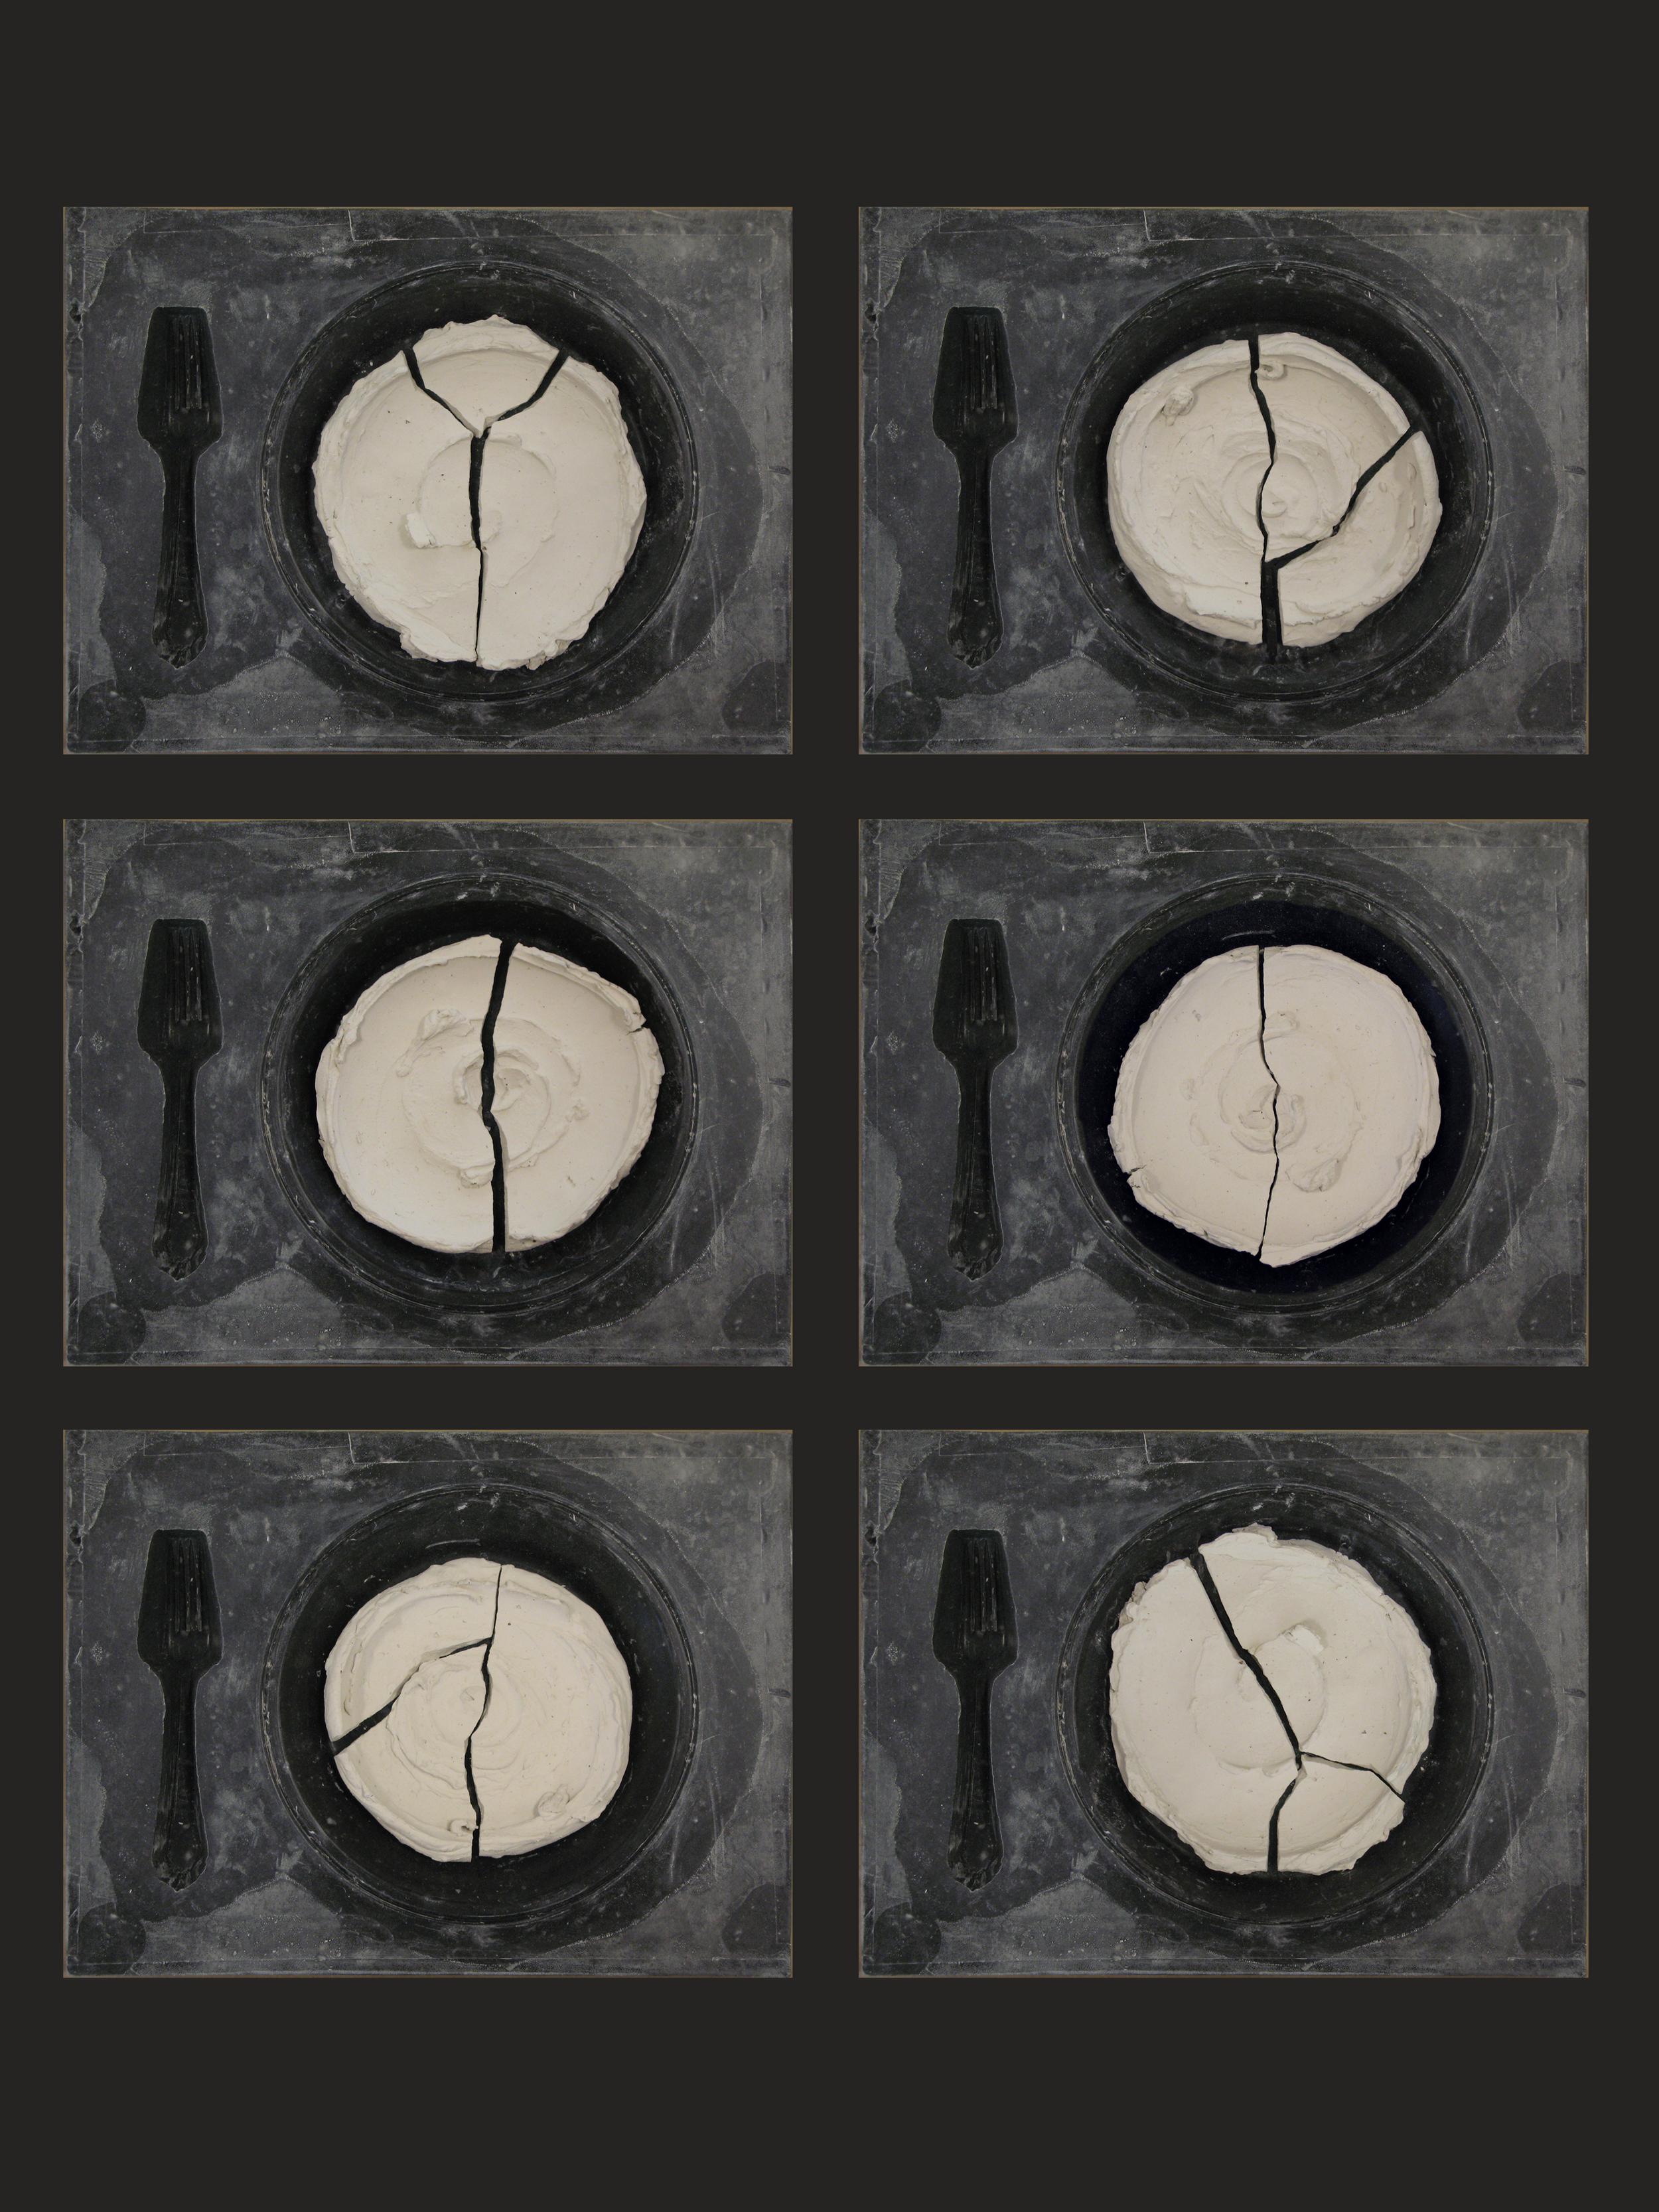 SHARE, 2010, Haitian mud, smidgeon of margarine, smidgeon of salt, elite granite, absent fork